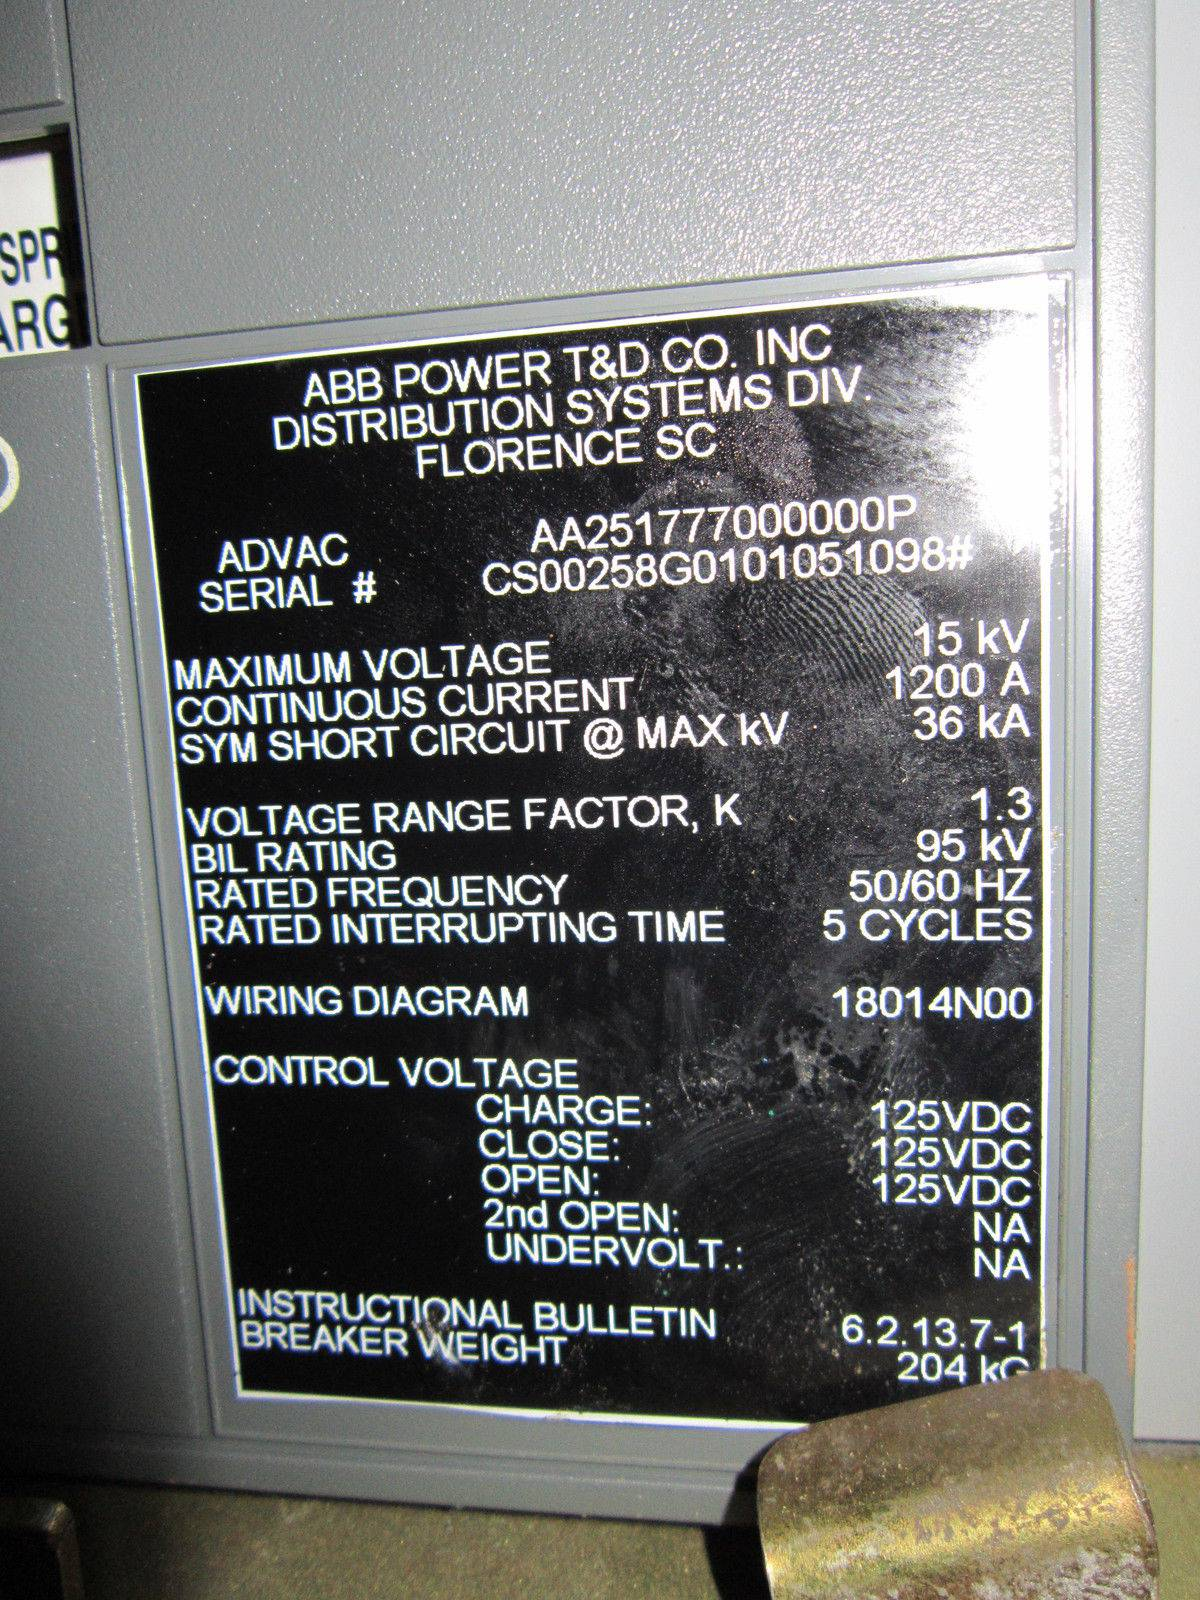 Abb Advac 15kv 1200a Aa251777000000p Vacuum Circuit Breaker 5cyc 15 Air Wiring Diagram Kv 1200 Amp Ebi0075 7 River City Industrial